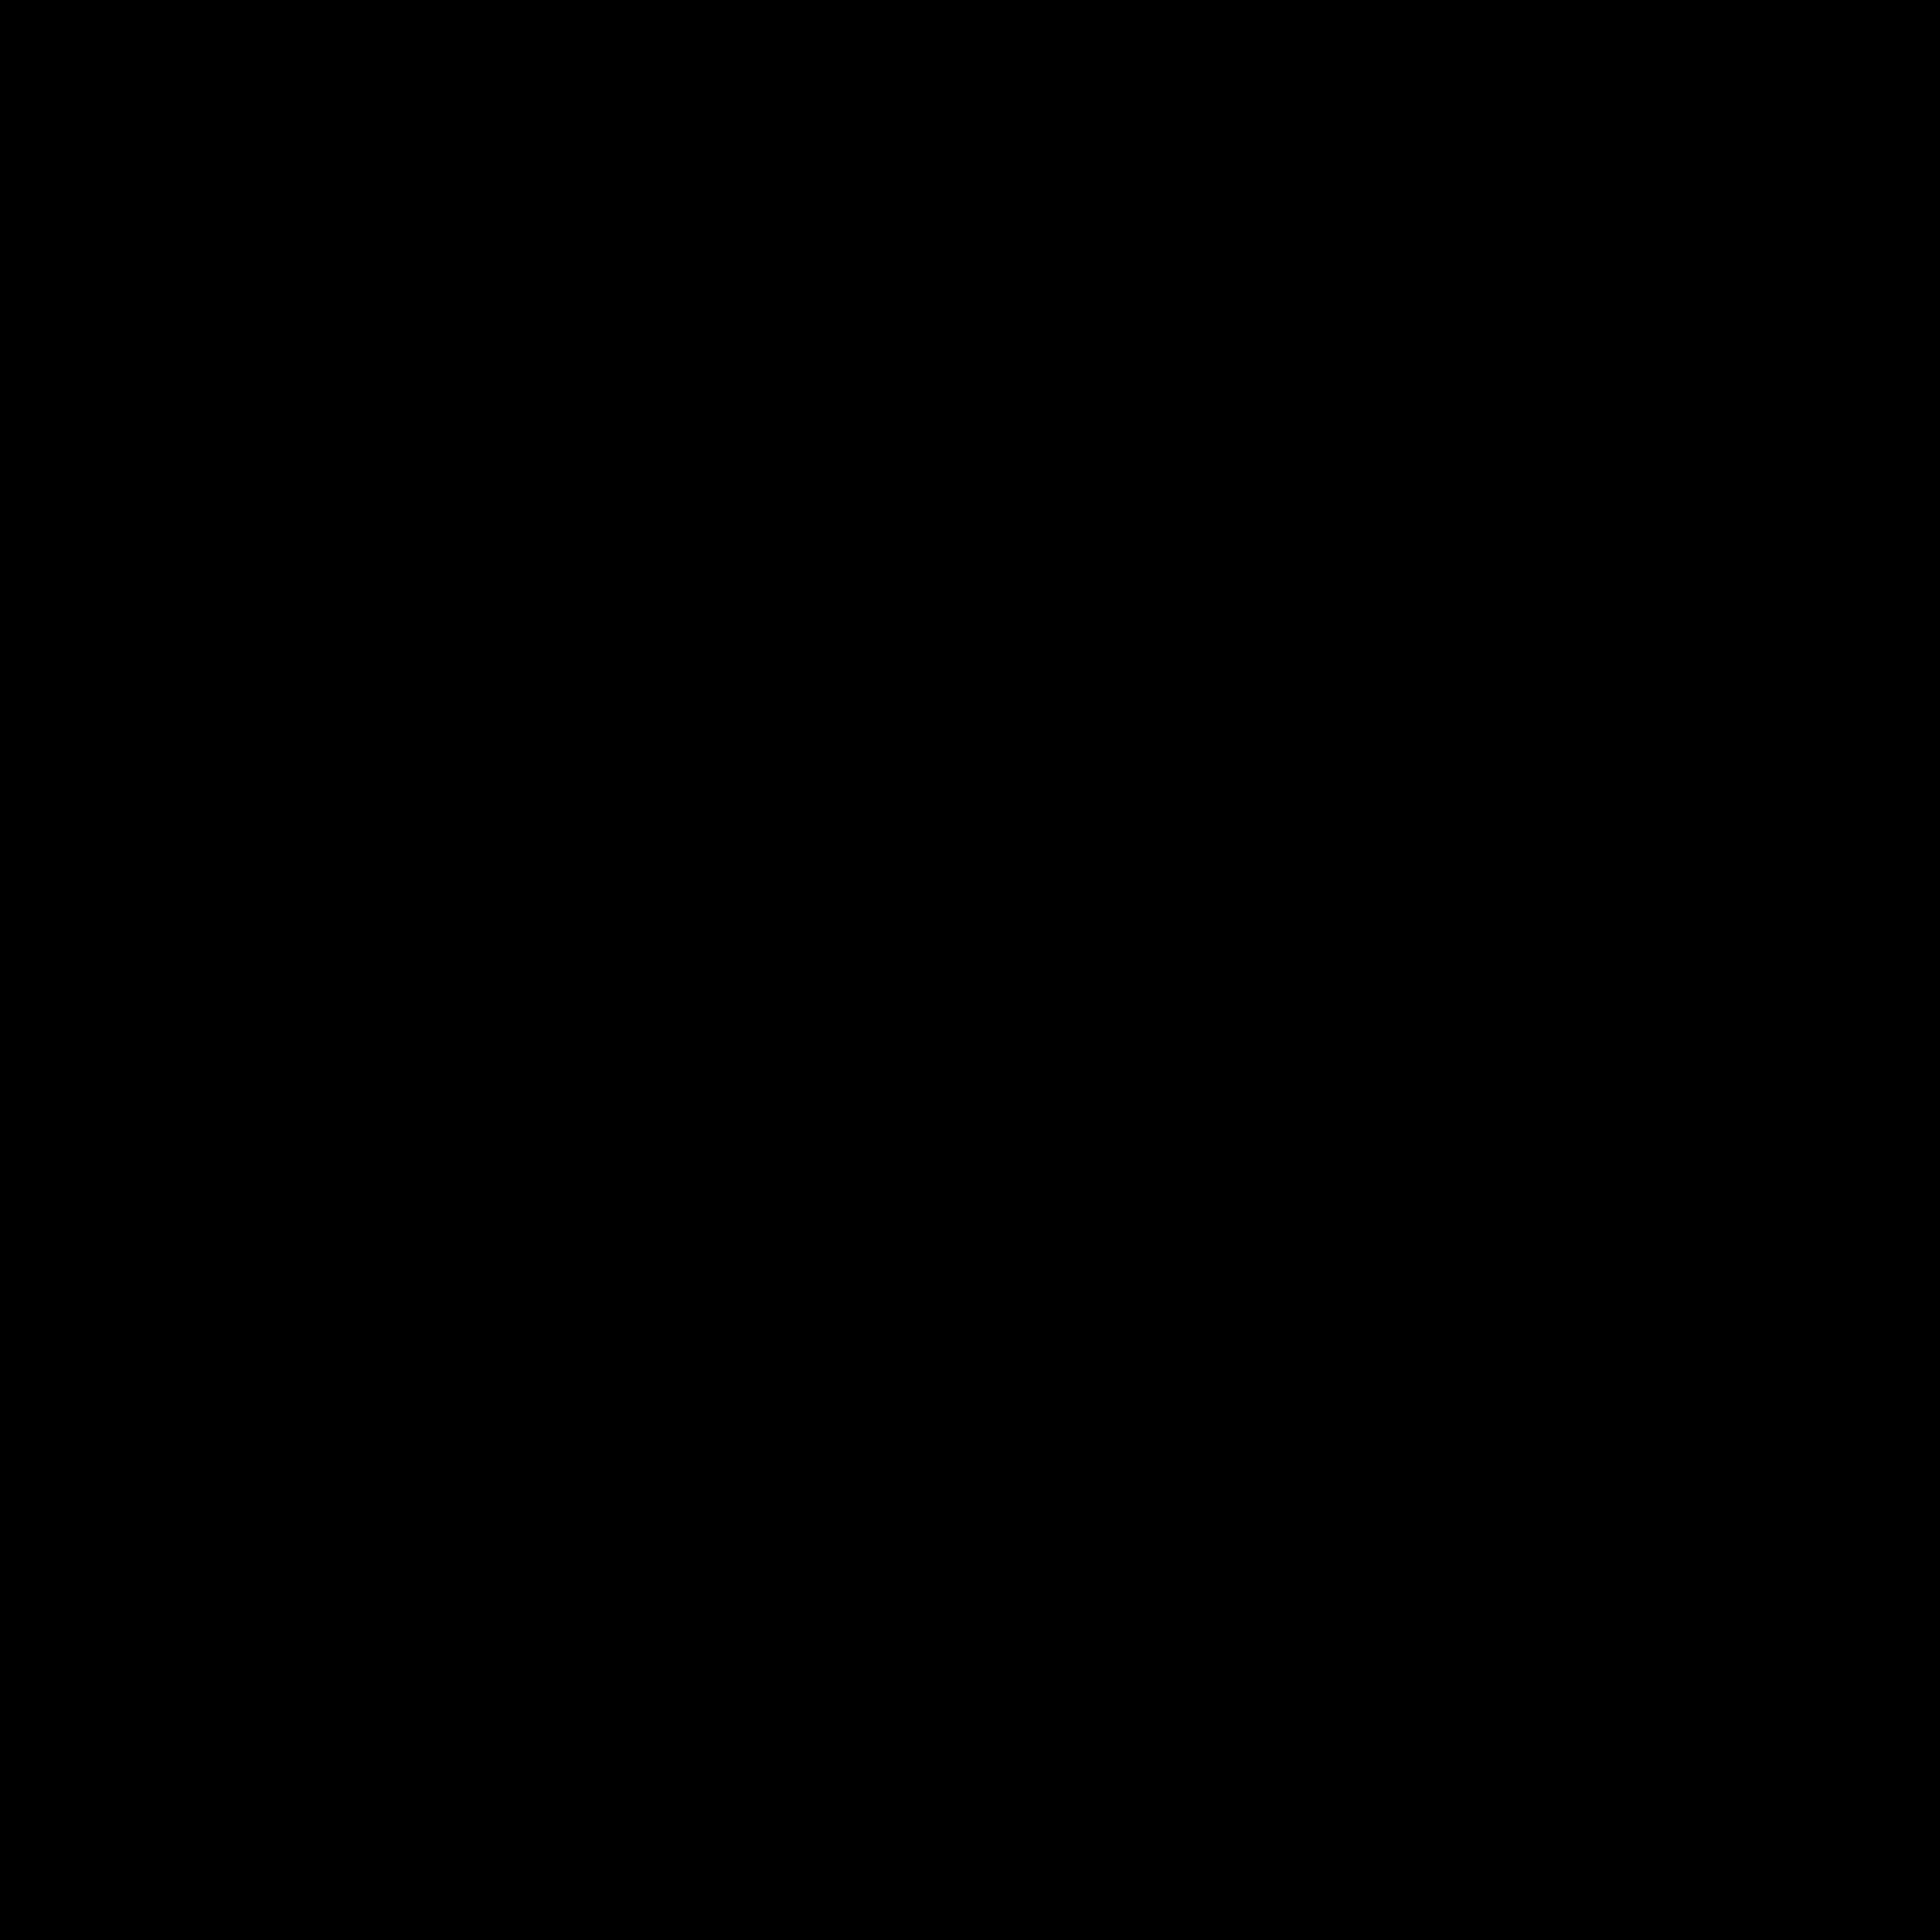 Grundge clipart black grunge Clipart Pattern Pattern Tileable Grunge